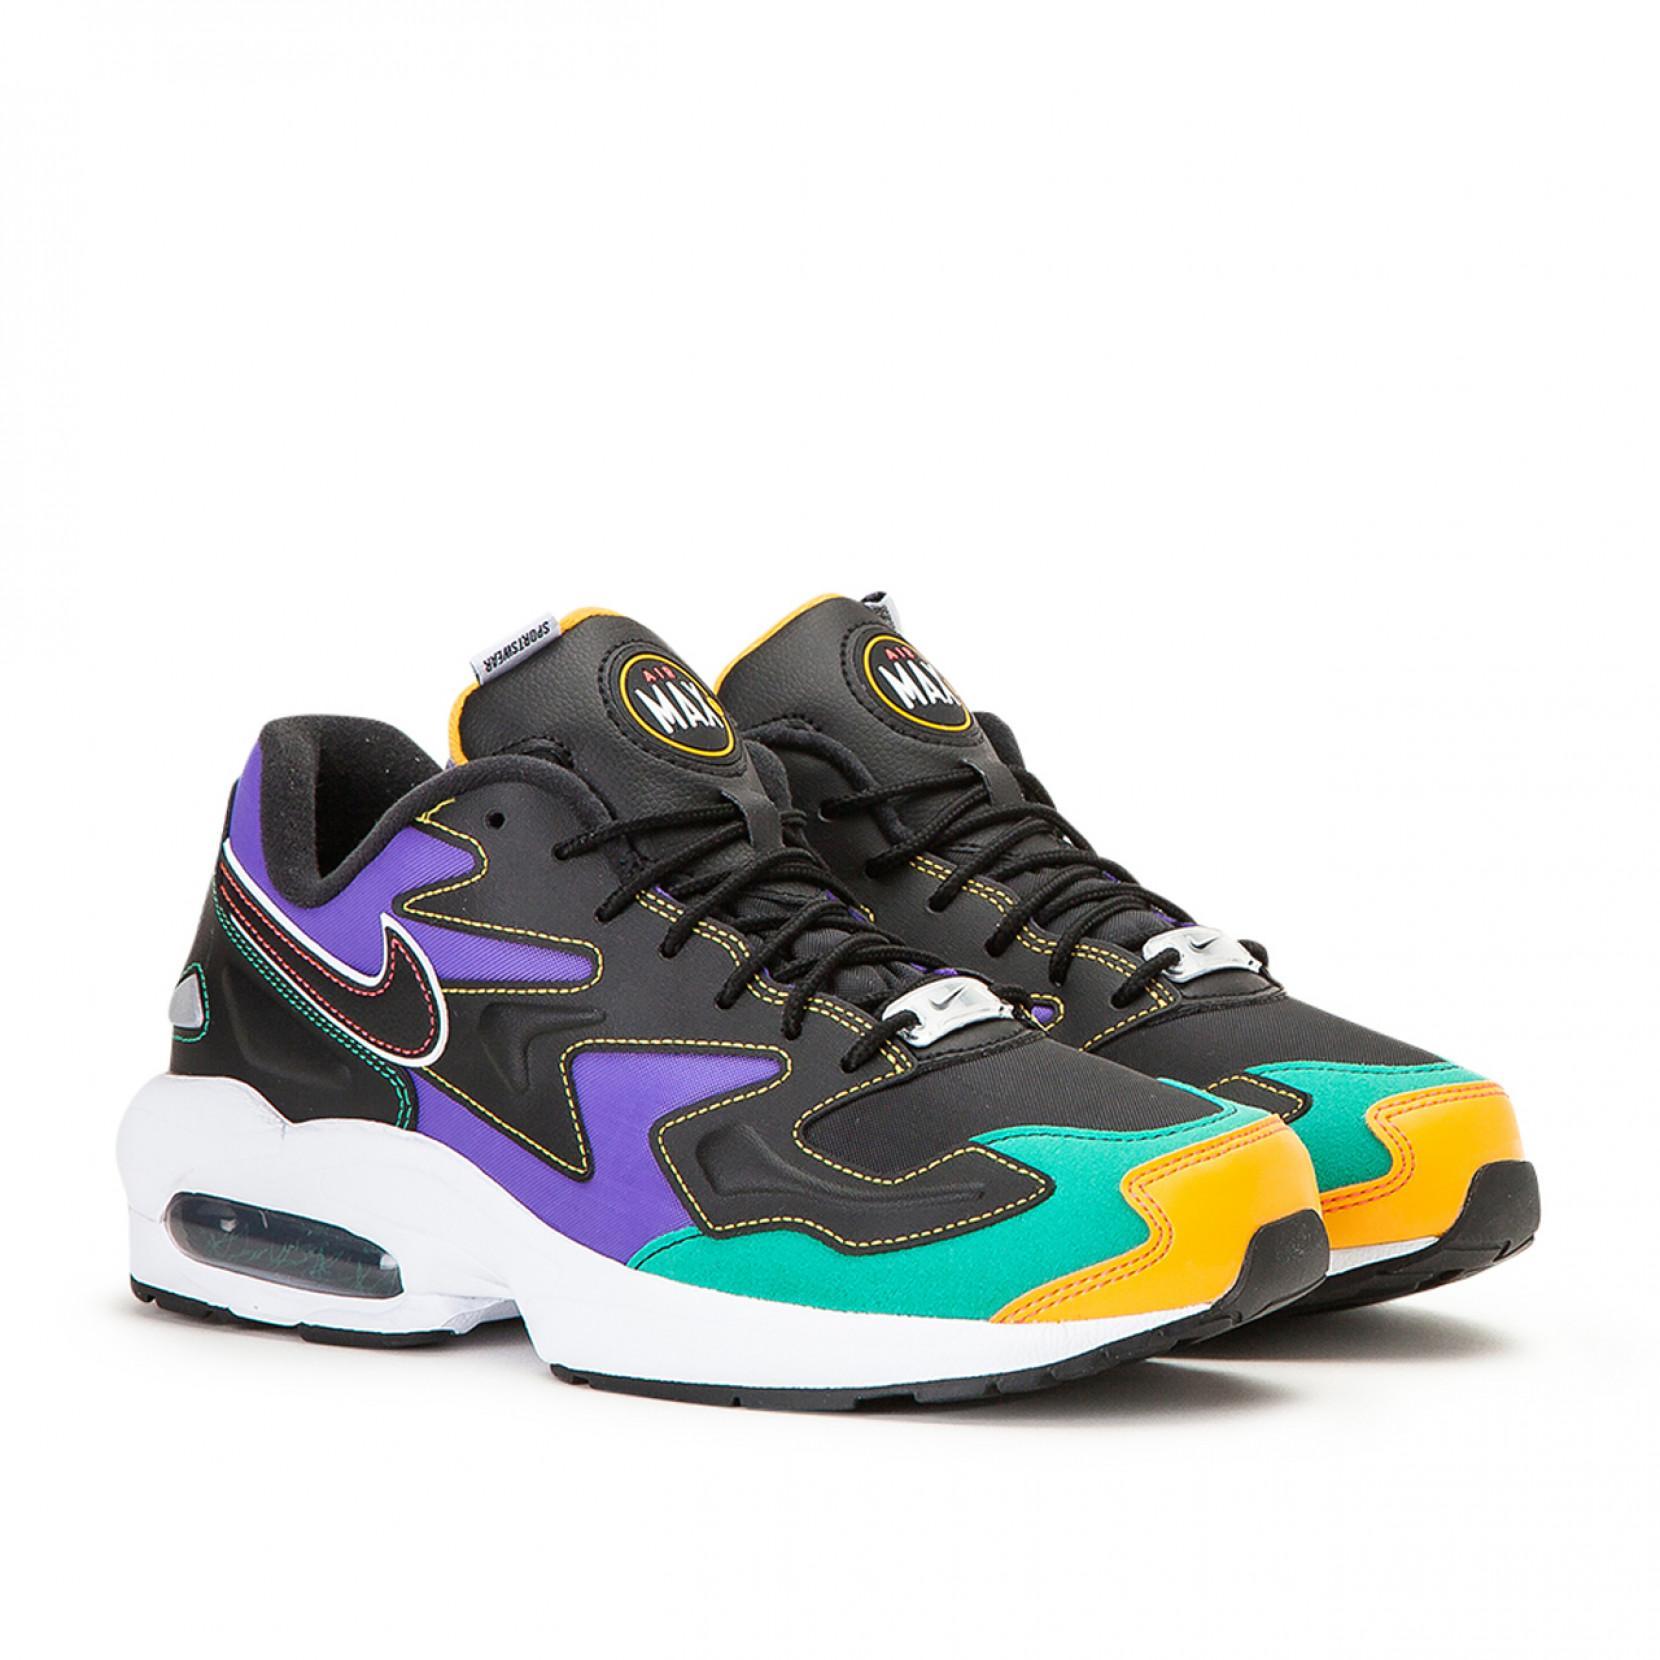 Nike Air Max2 Light Premium Shoe (black) - Clearance Sale for Men ...